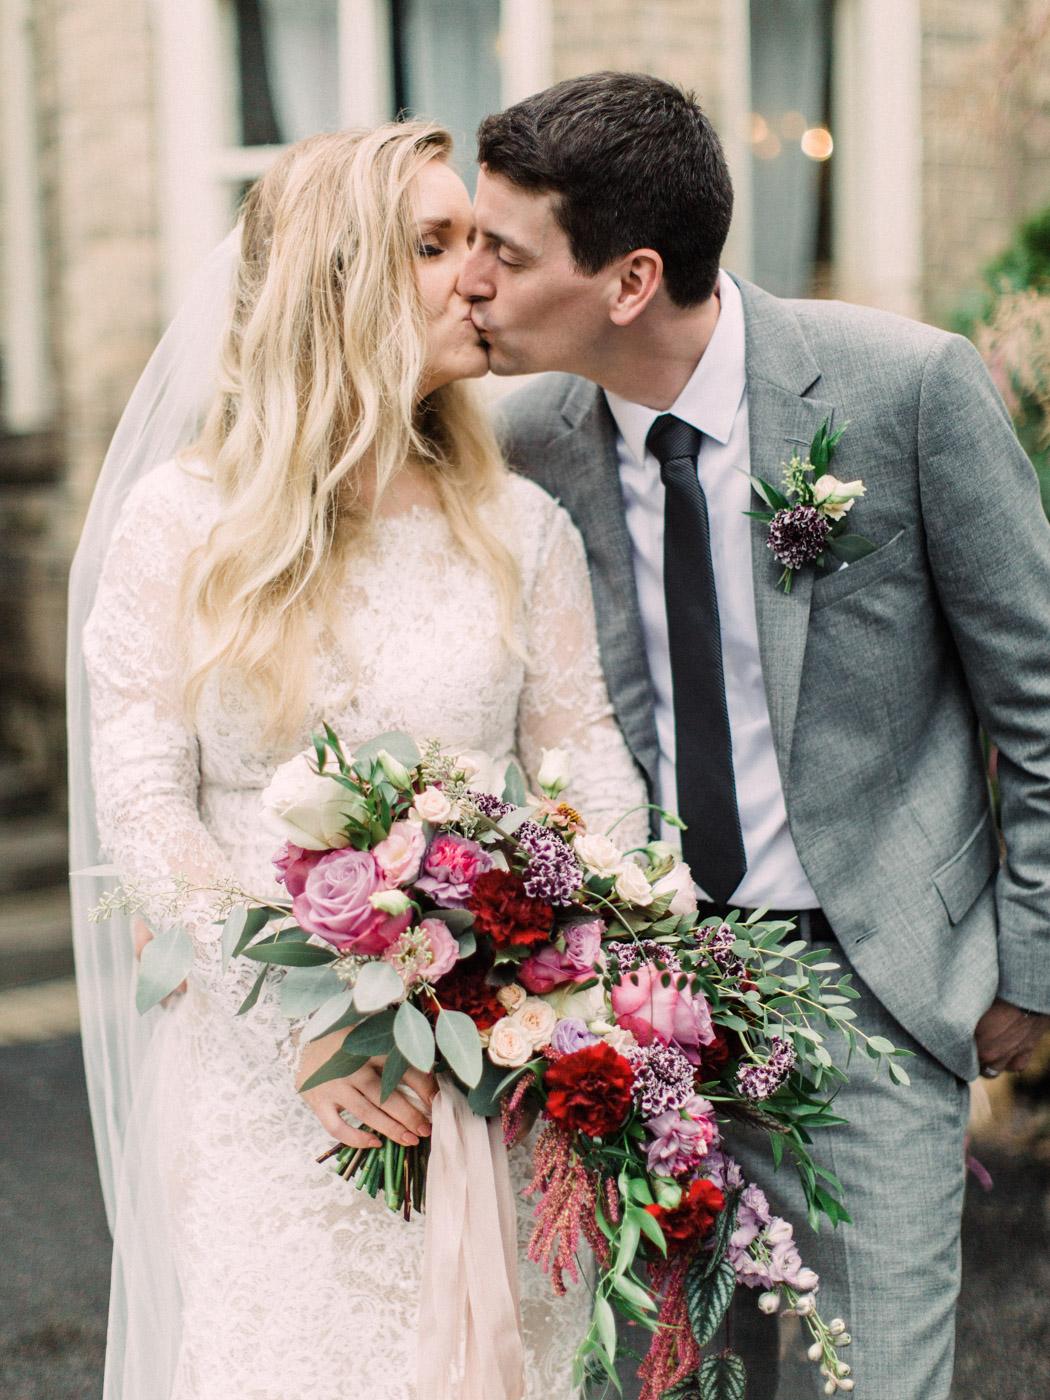 Toronto-wedding-photographer-intimate-classic-fine-art-elopement-ottawa61.jpg